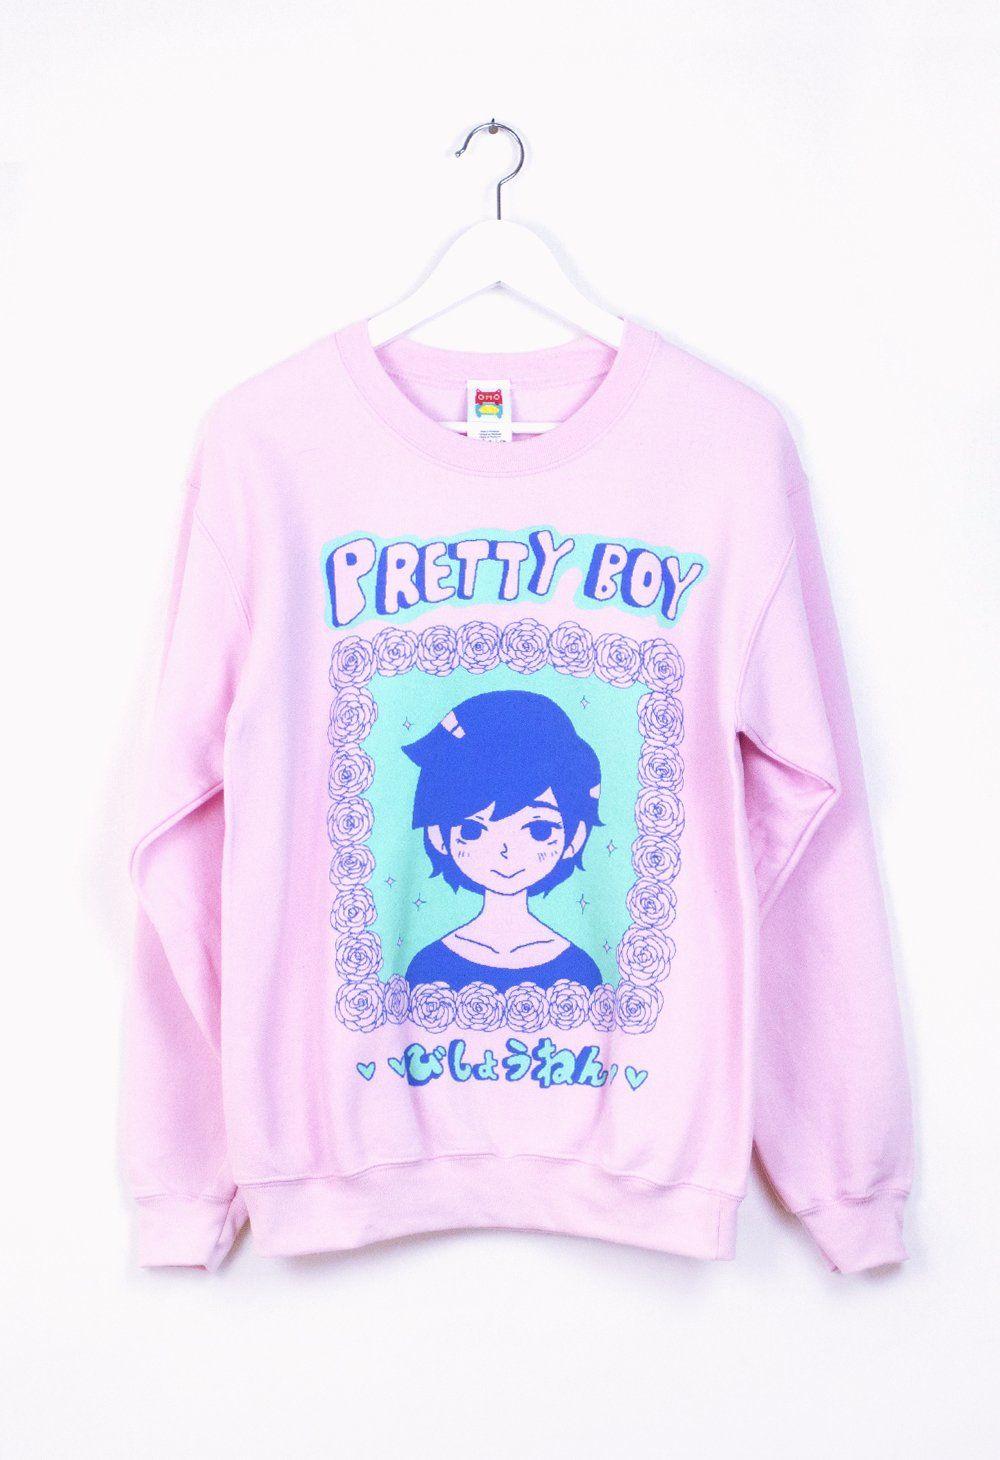 Prettyboy pink sweater kawaii clothes fashion blue